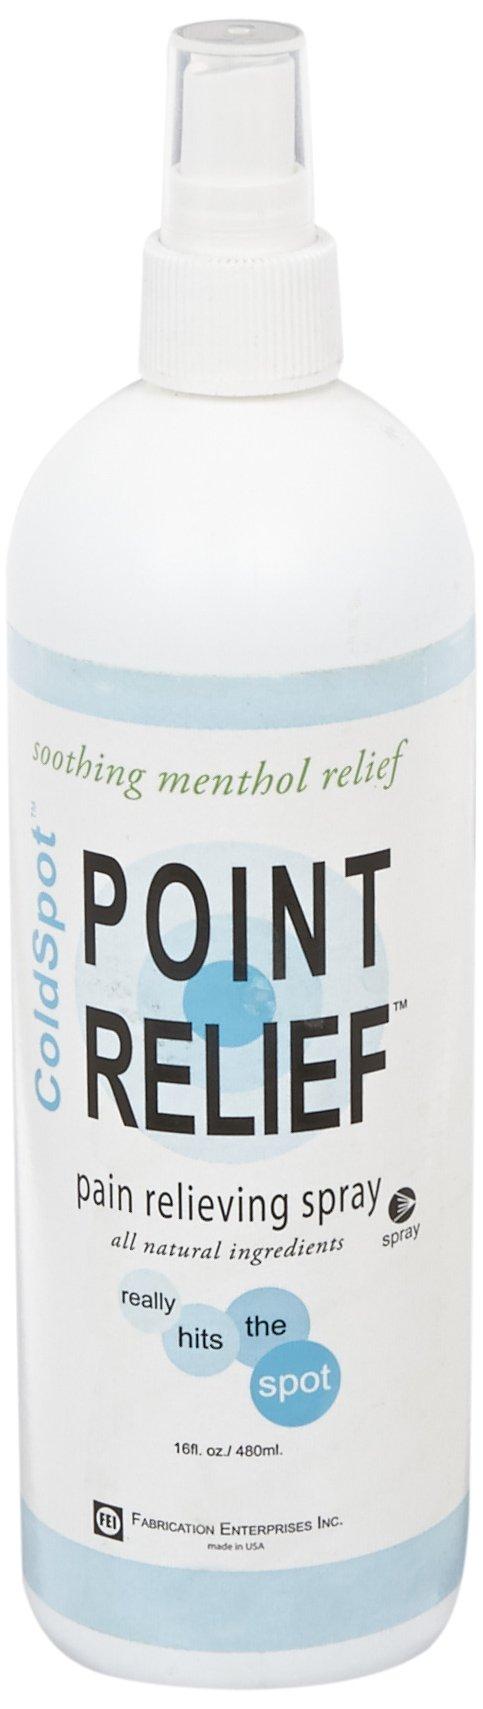 Point Relief 11-0702-1 ColdSpot Spray, 16 oz Bottle